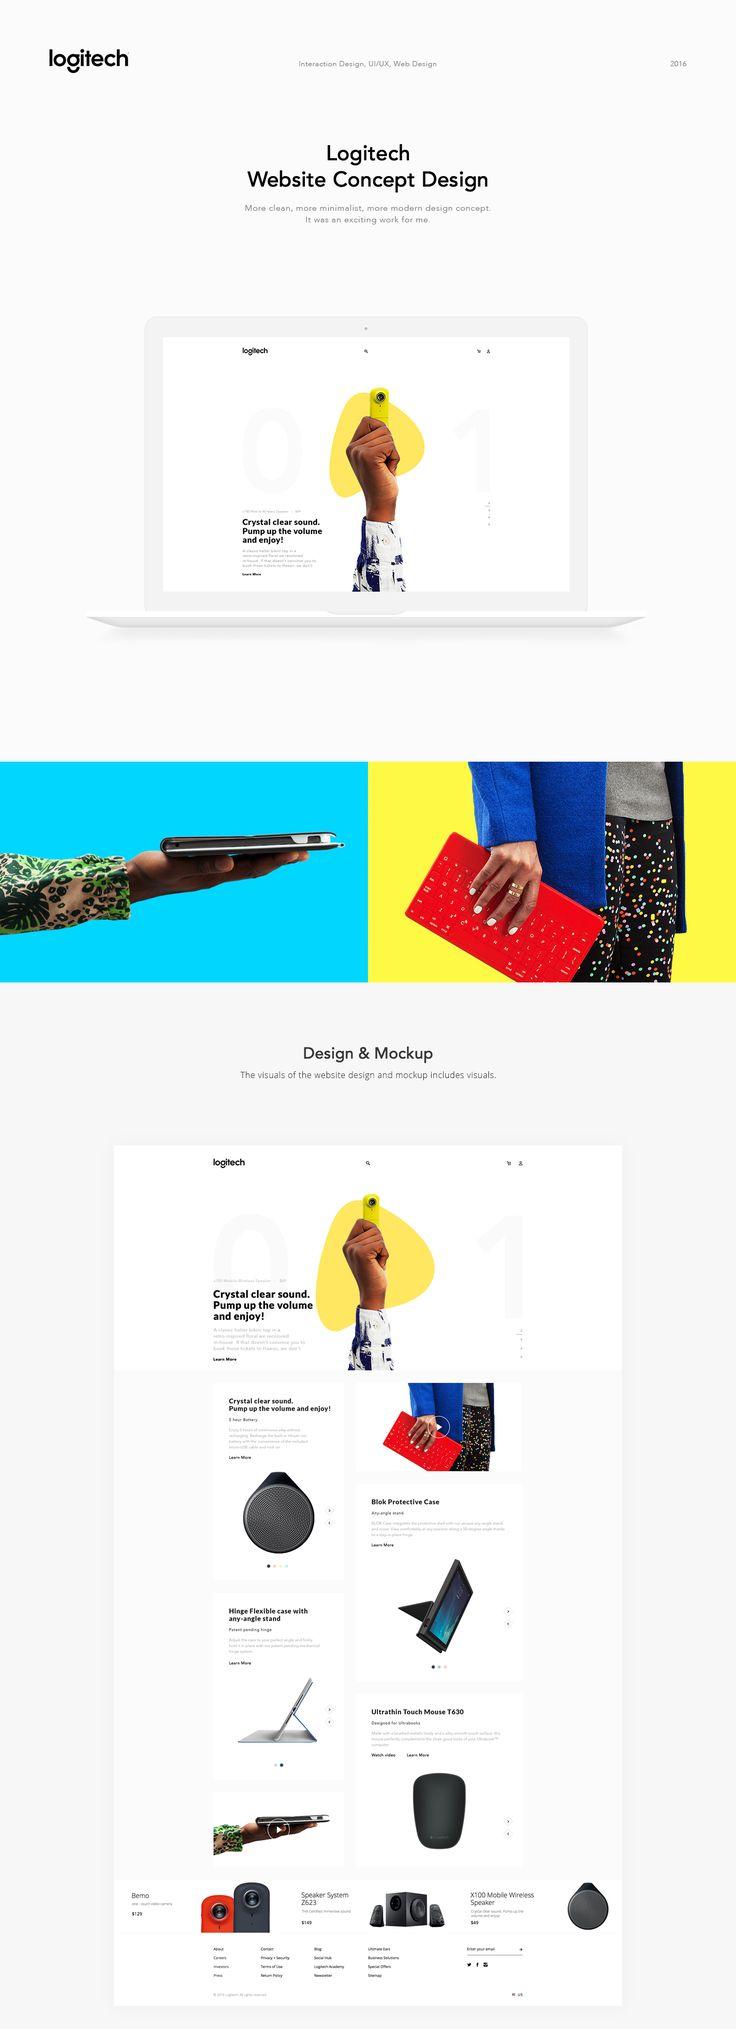 Logitech Website Concept Design on Behance